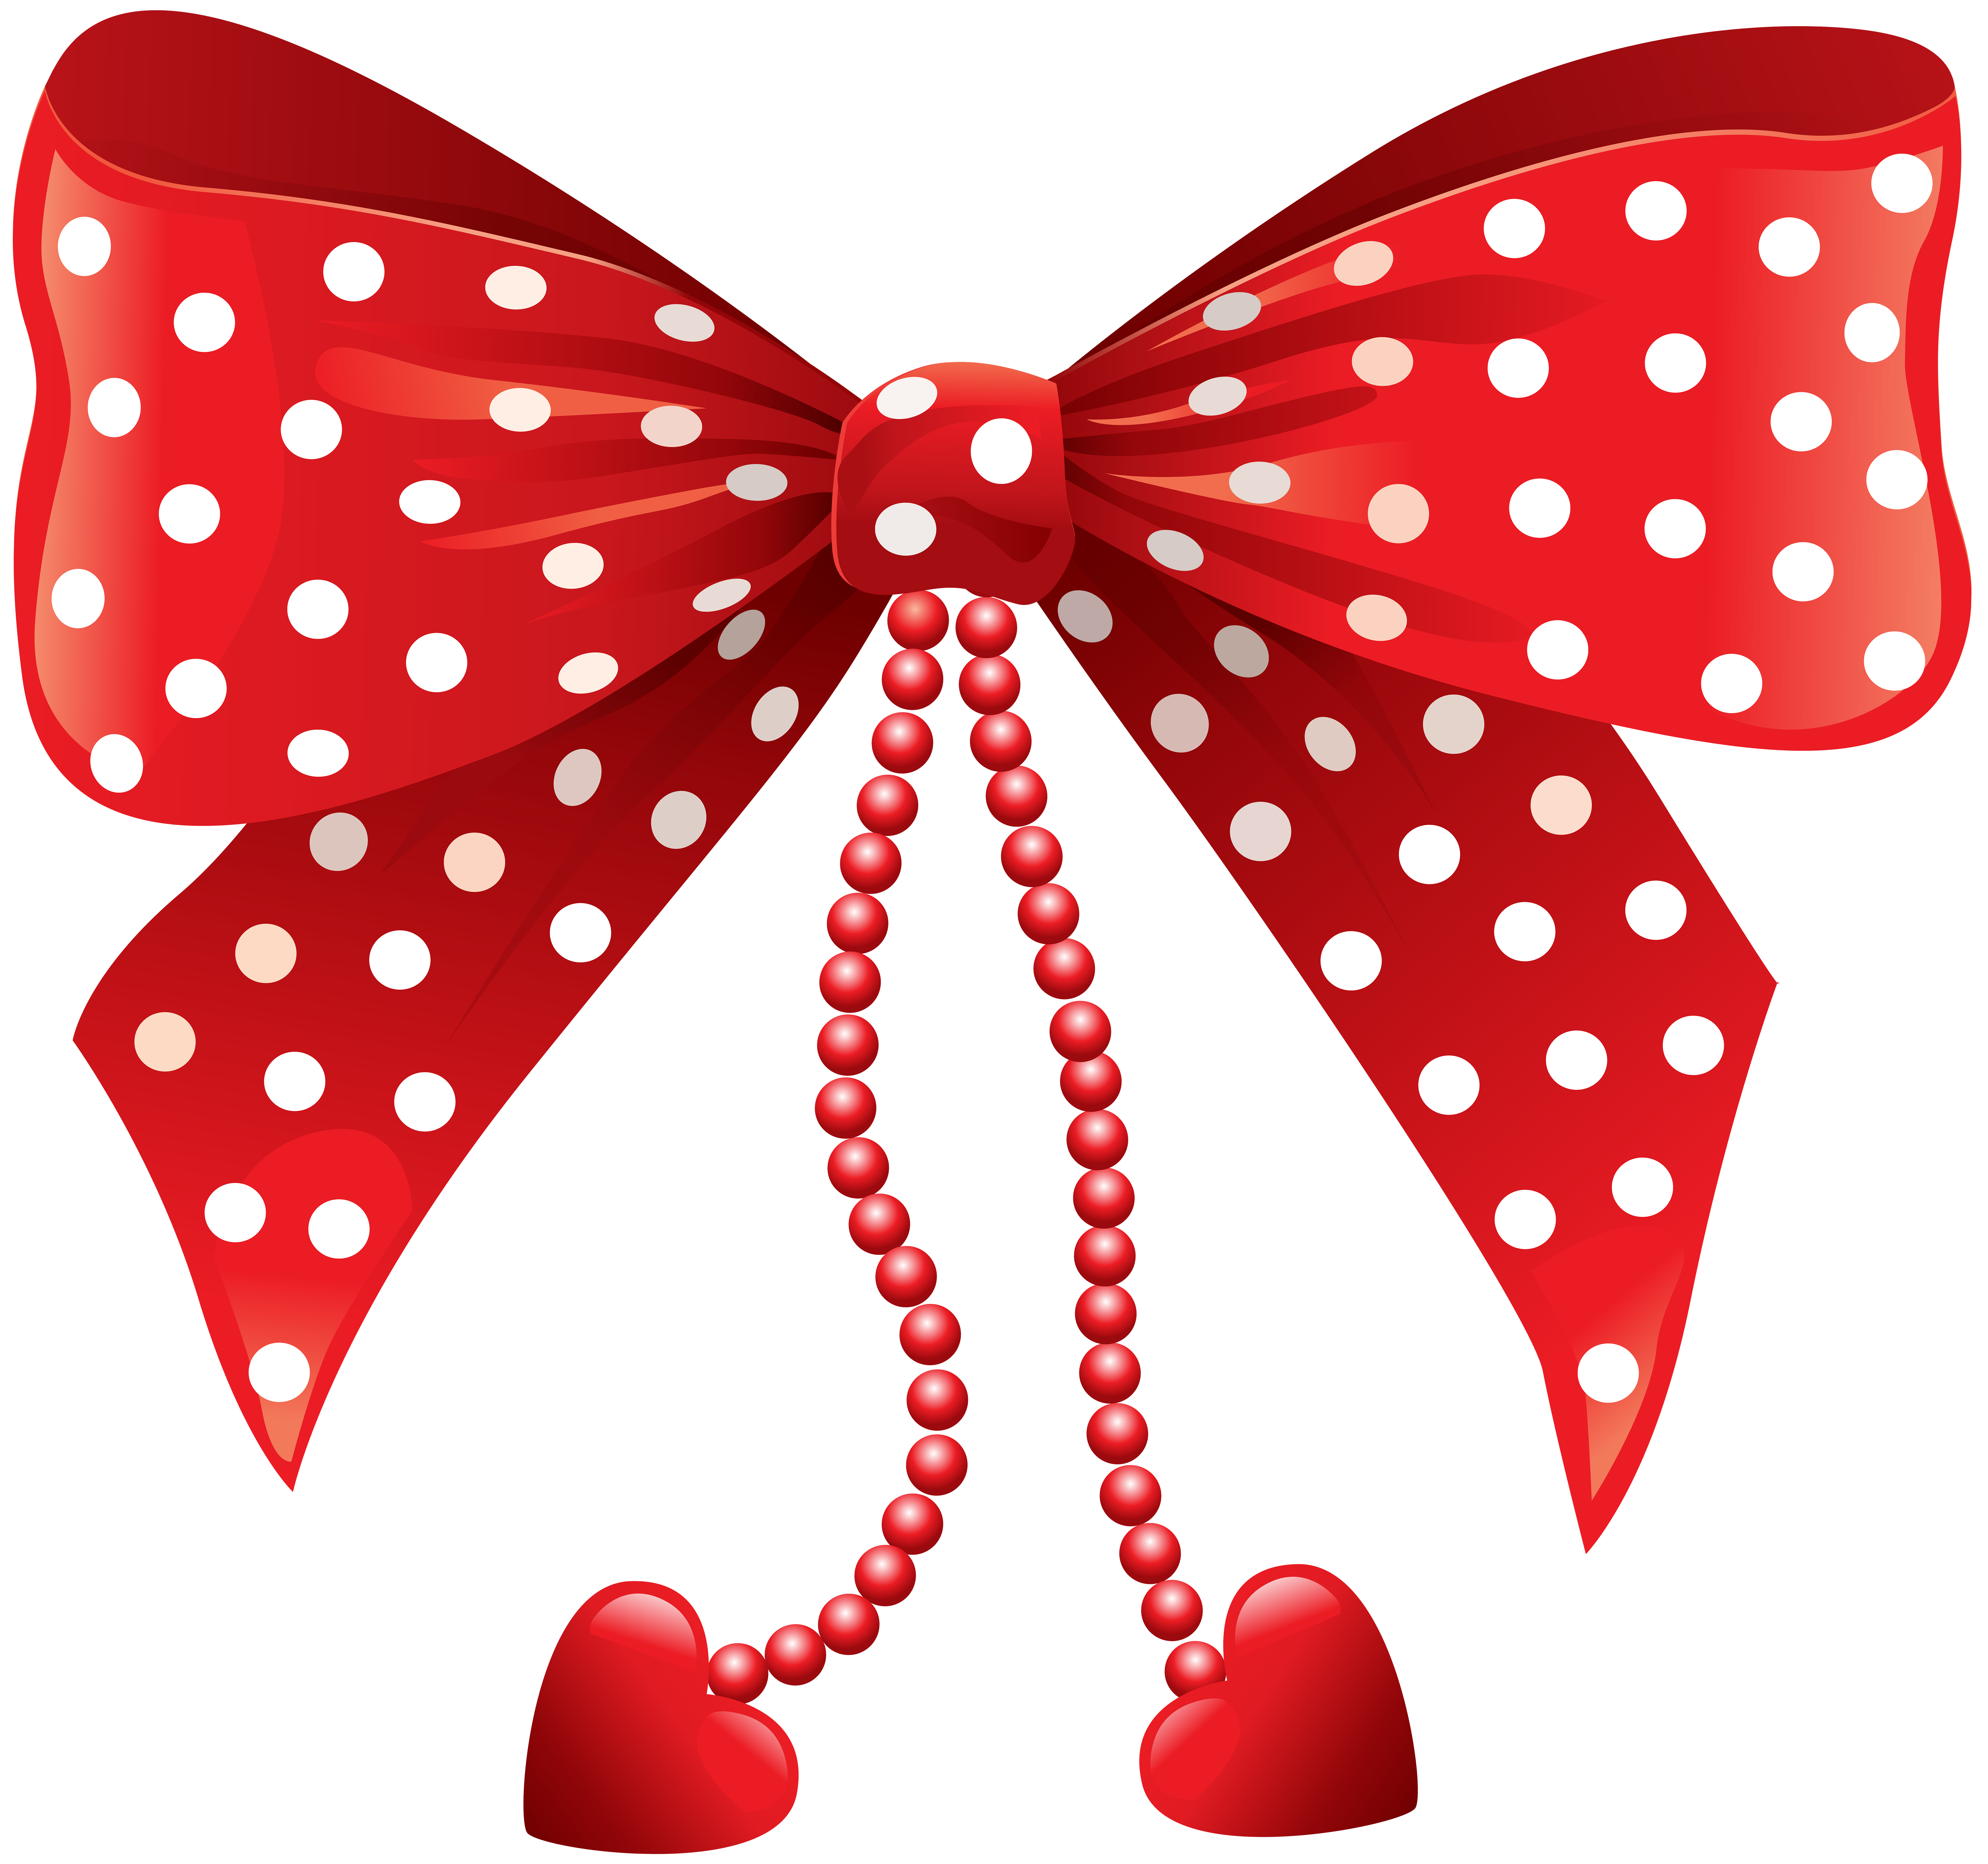 8000x7501 Polka Dot Bow Transparent Clip Art Imageu200b Gallery Yopriceville